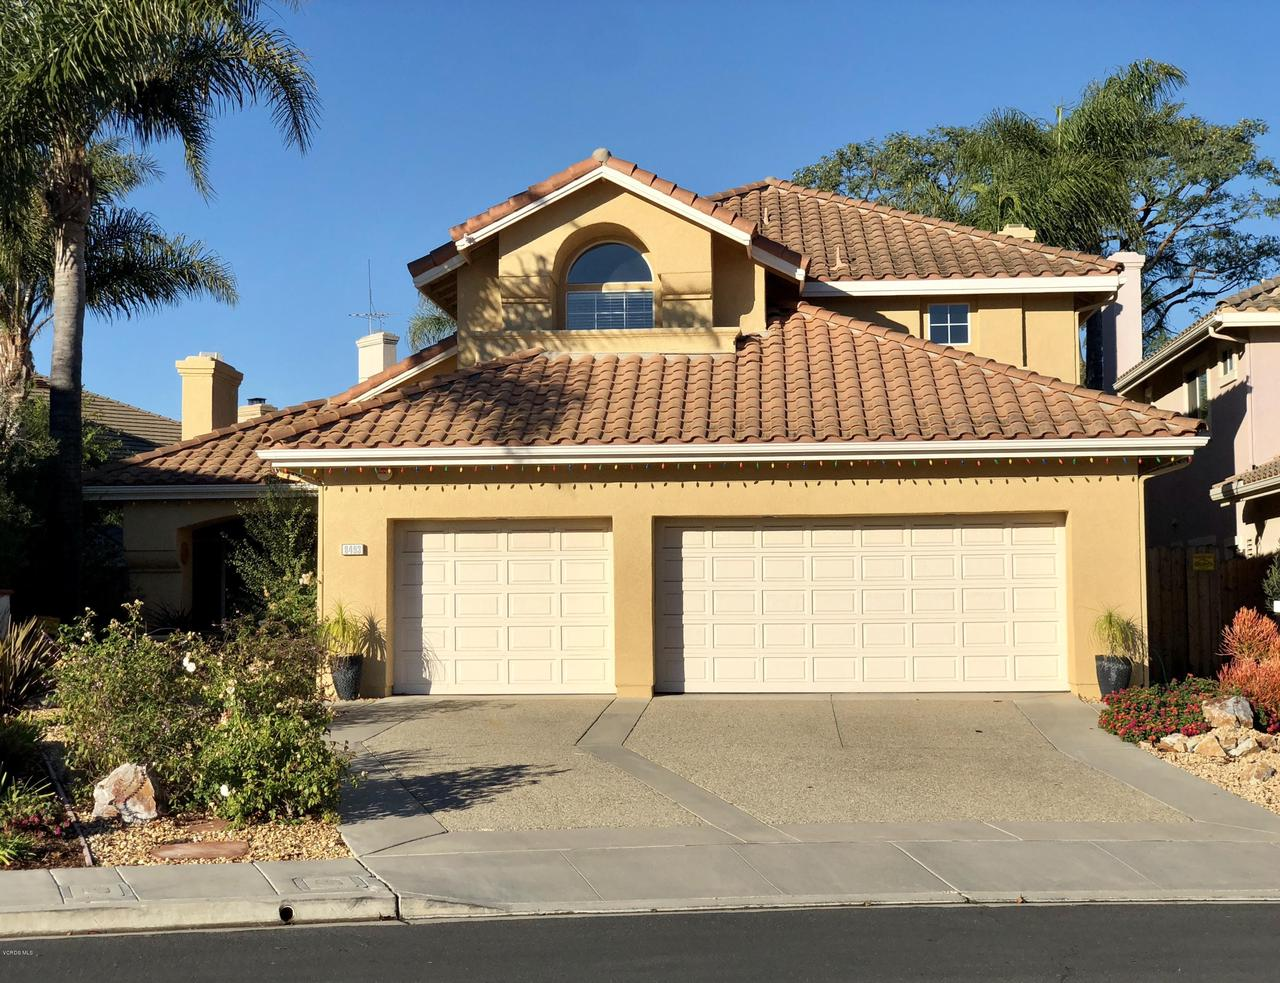 8493 HUMBOLDT, Ventura, CA 93004 - IMG_4585